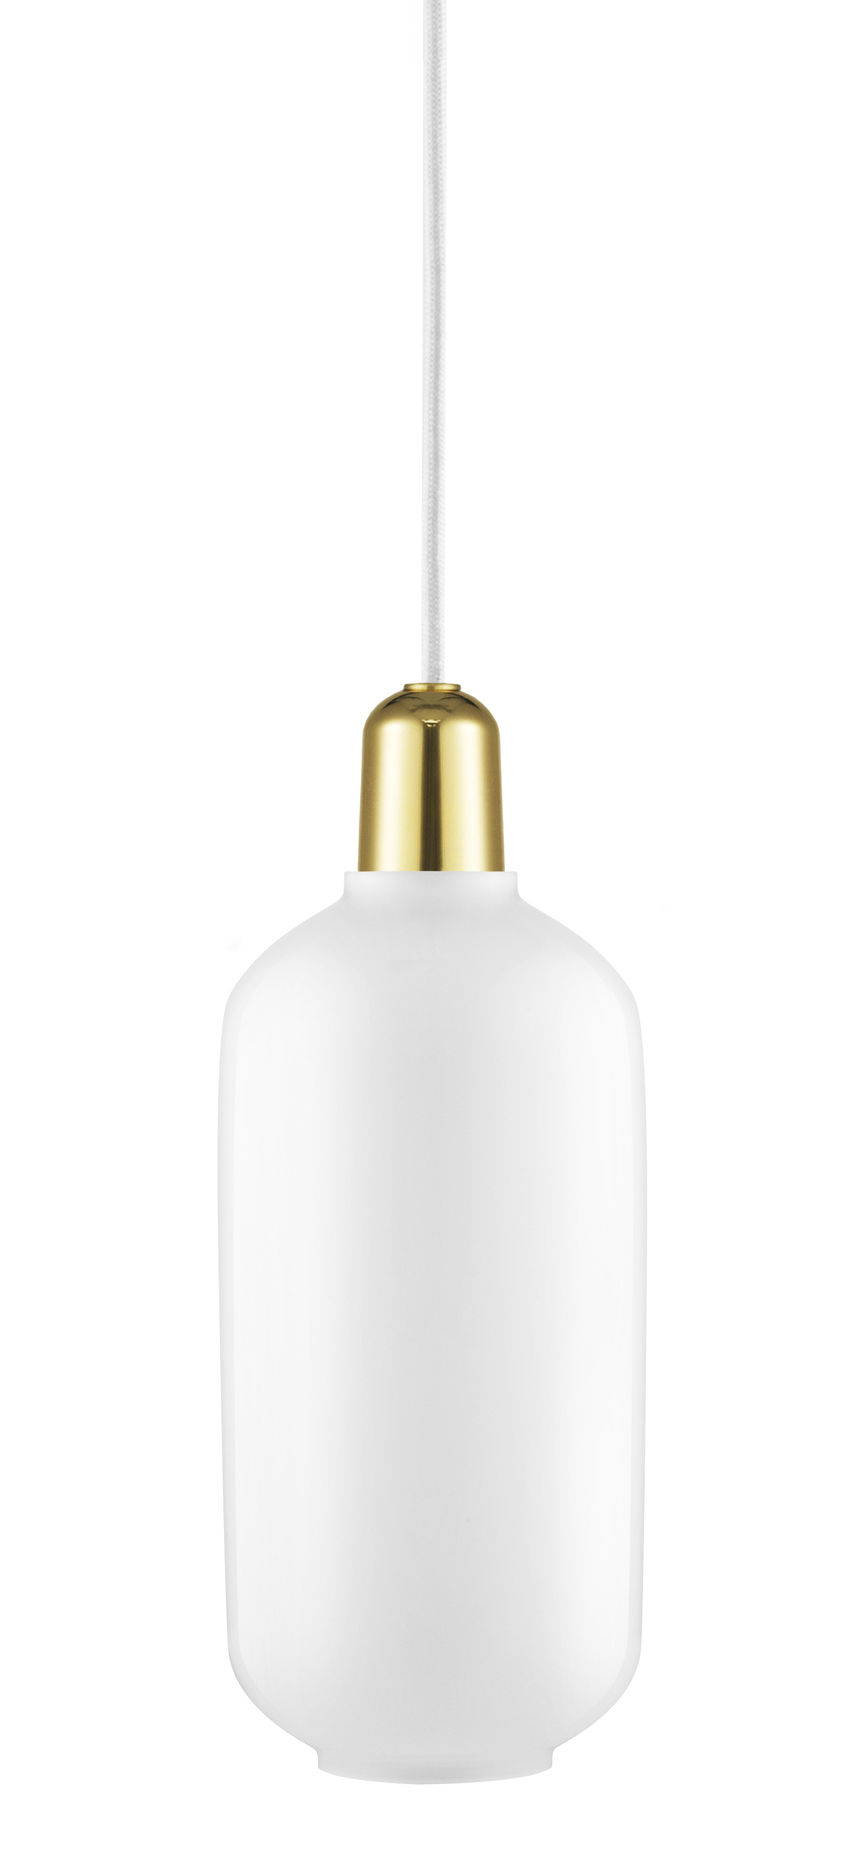 Amp Große Hängelampe - Ø 11,2 x H 26 cm Messing   Weiß Normann Copenhagen Simon Legald